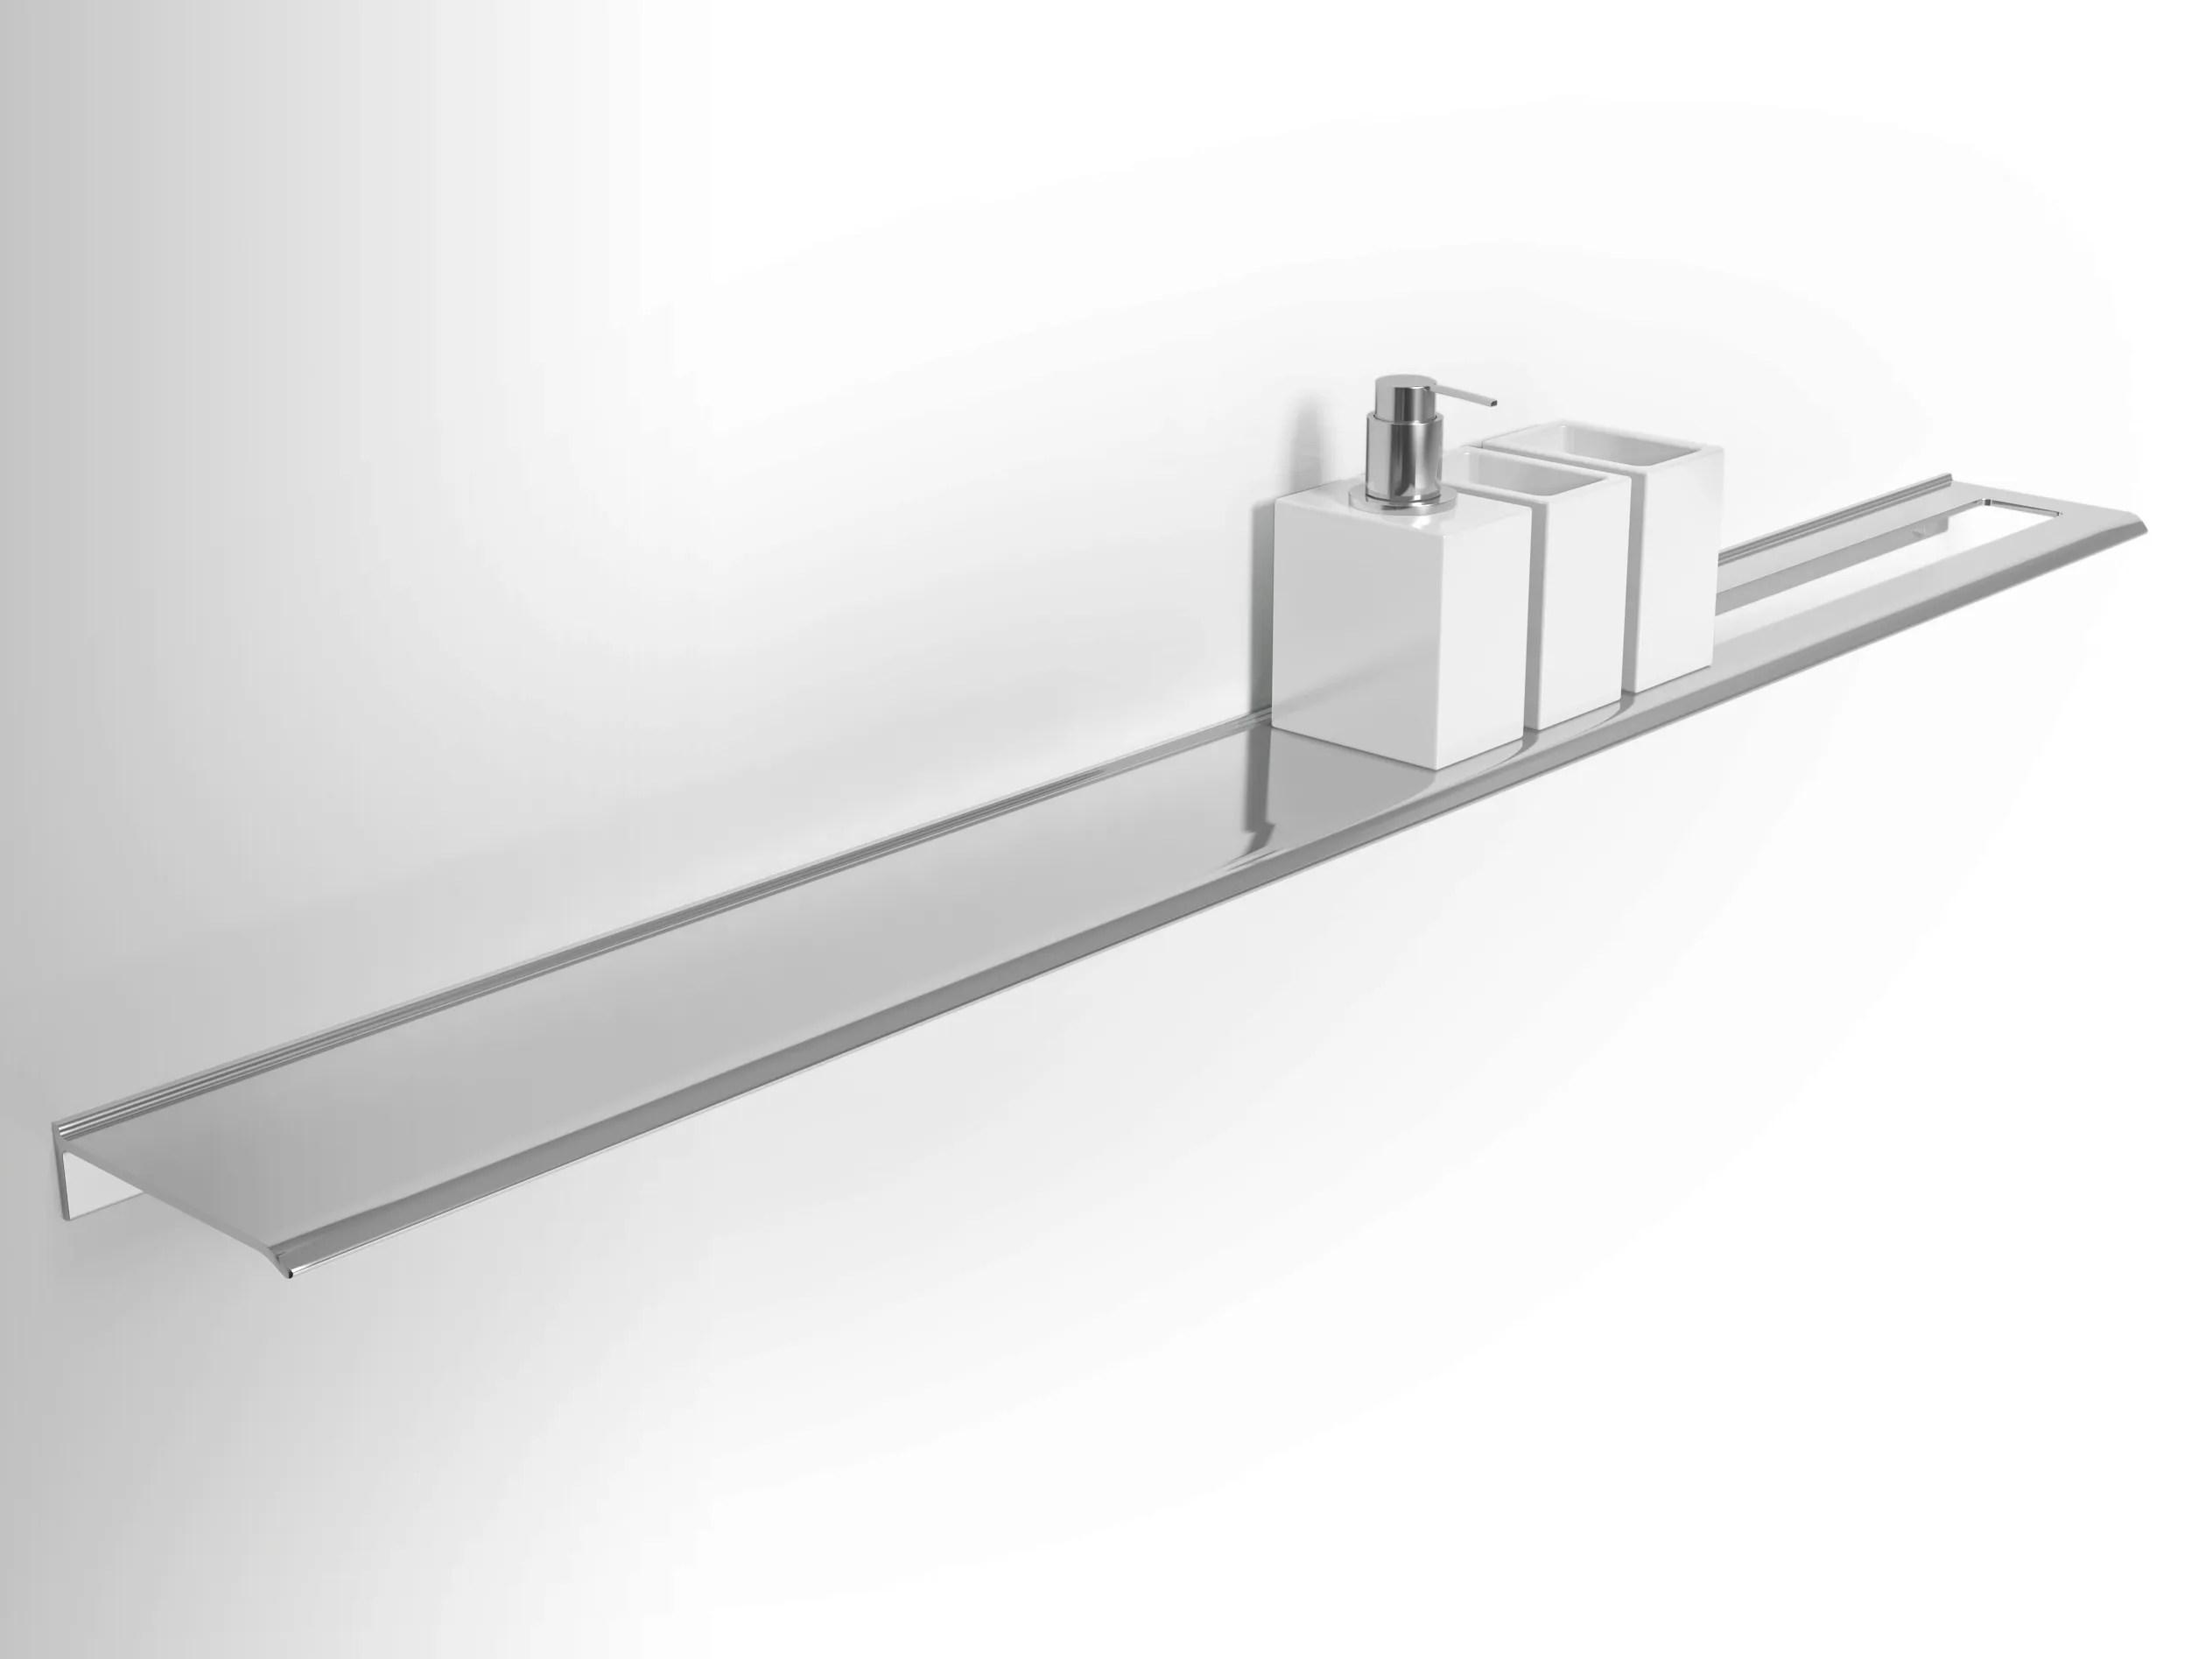 Fullsize Of Decorative Shelf For Bathroom